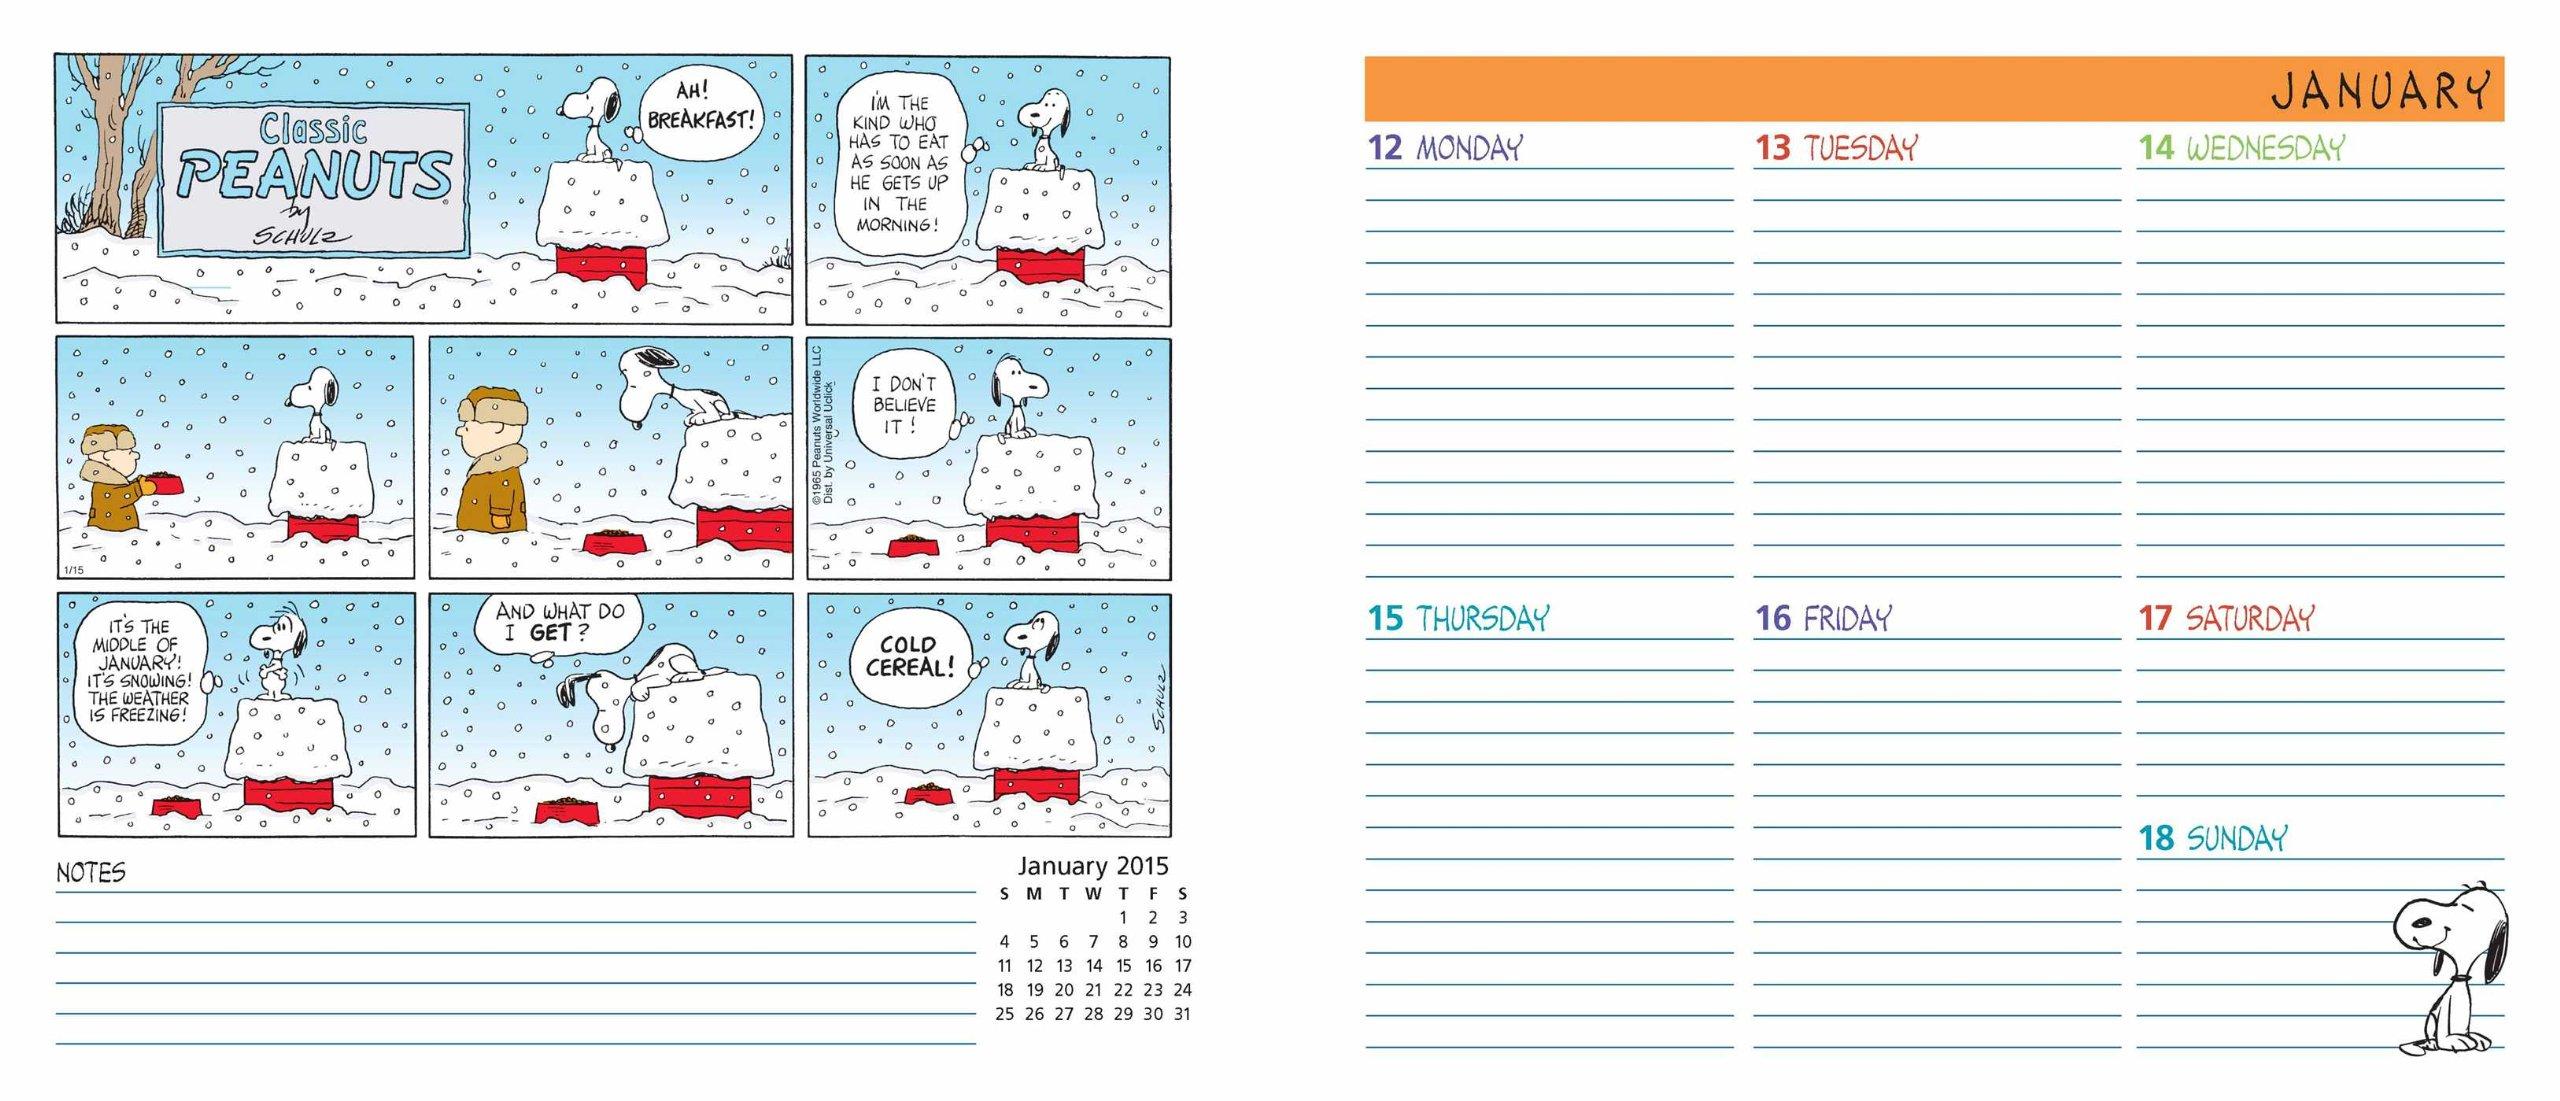 peanuts 2015 weekly planner calendar peanuts worldwide llc